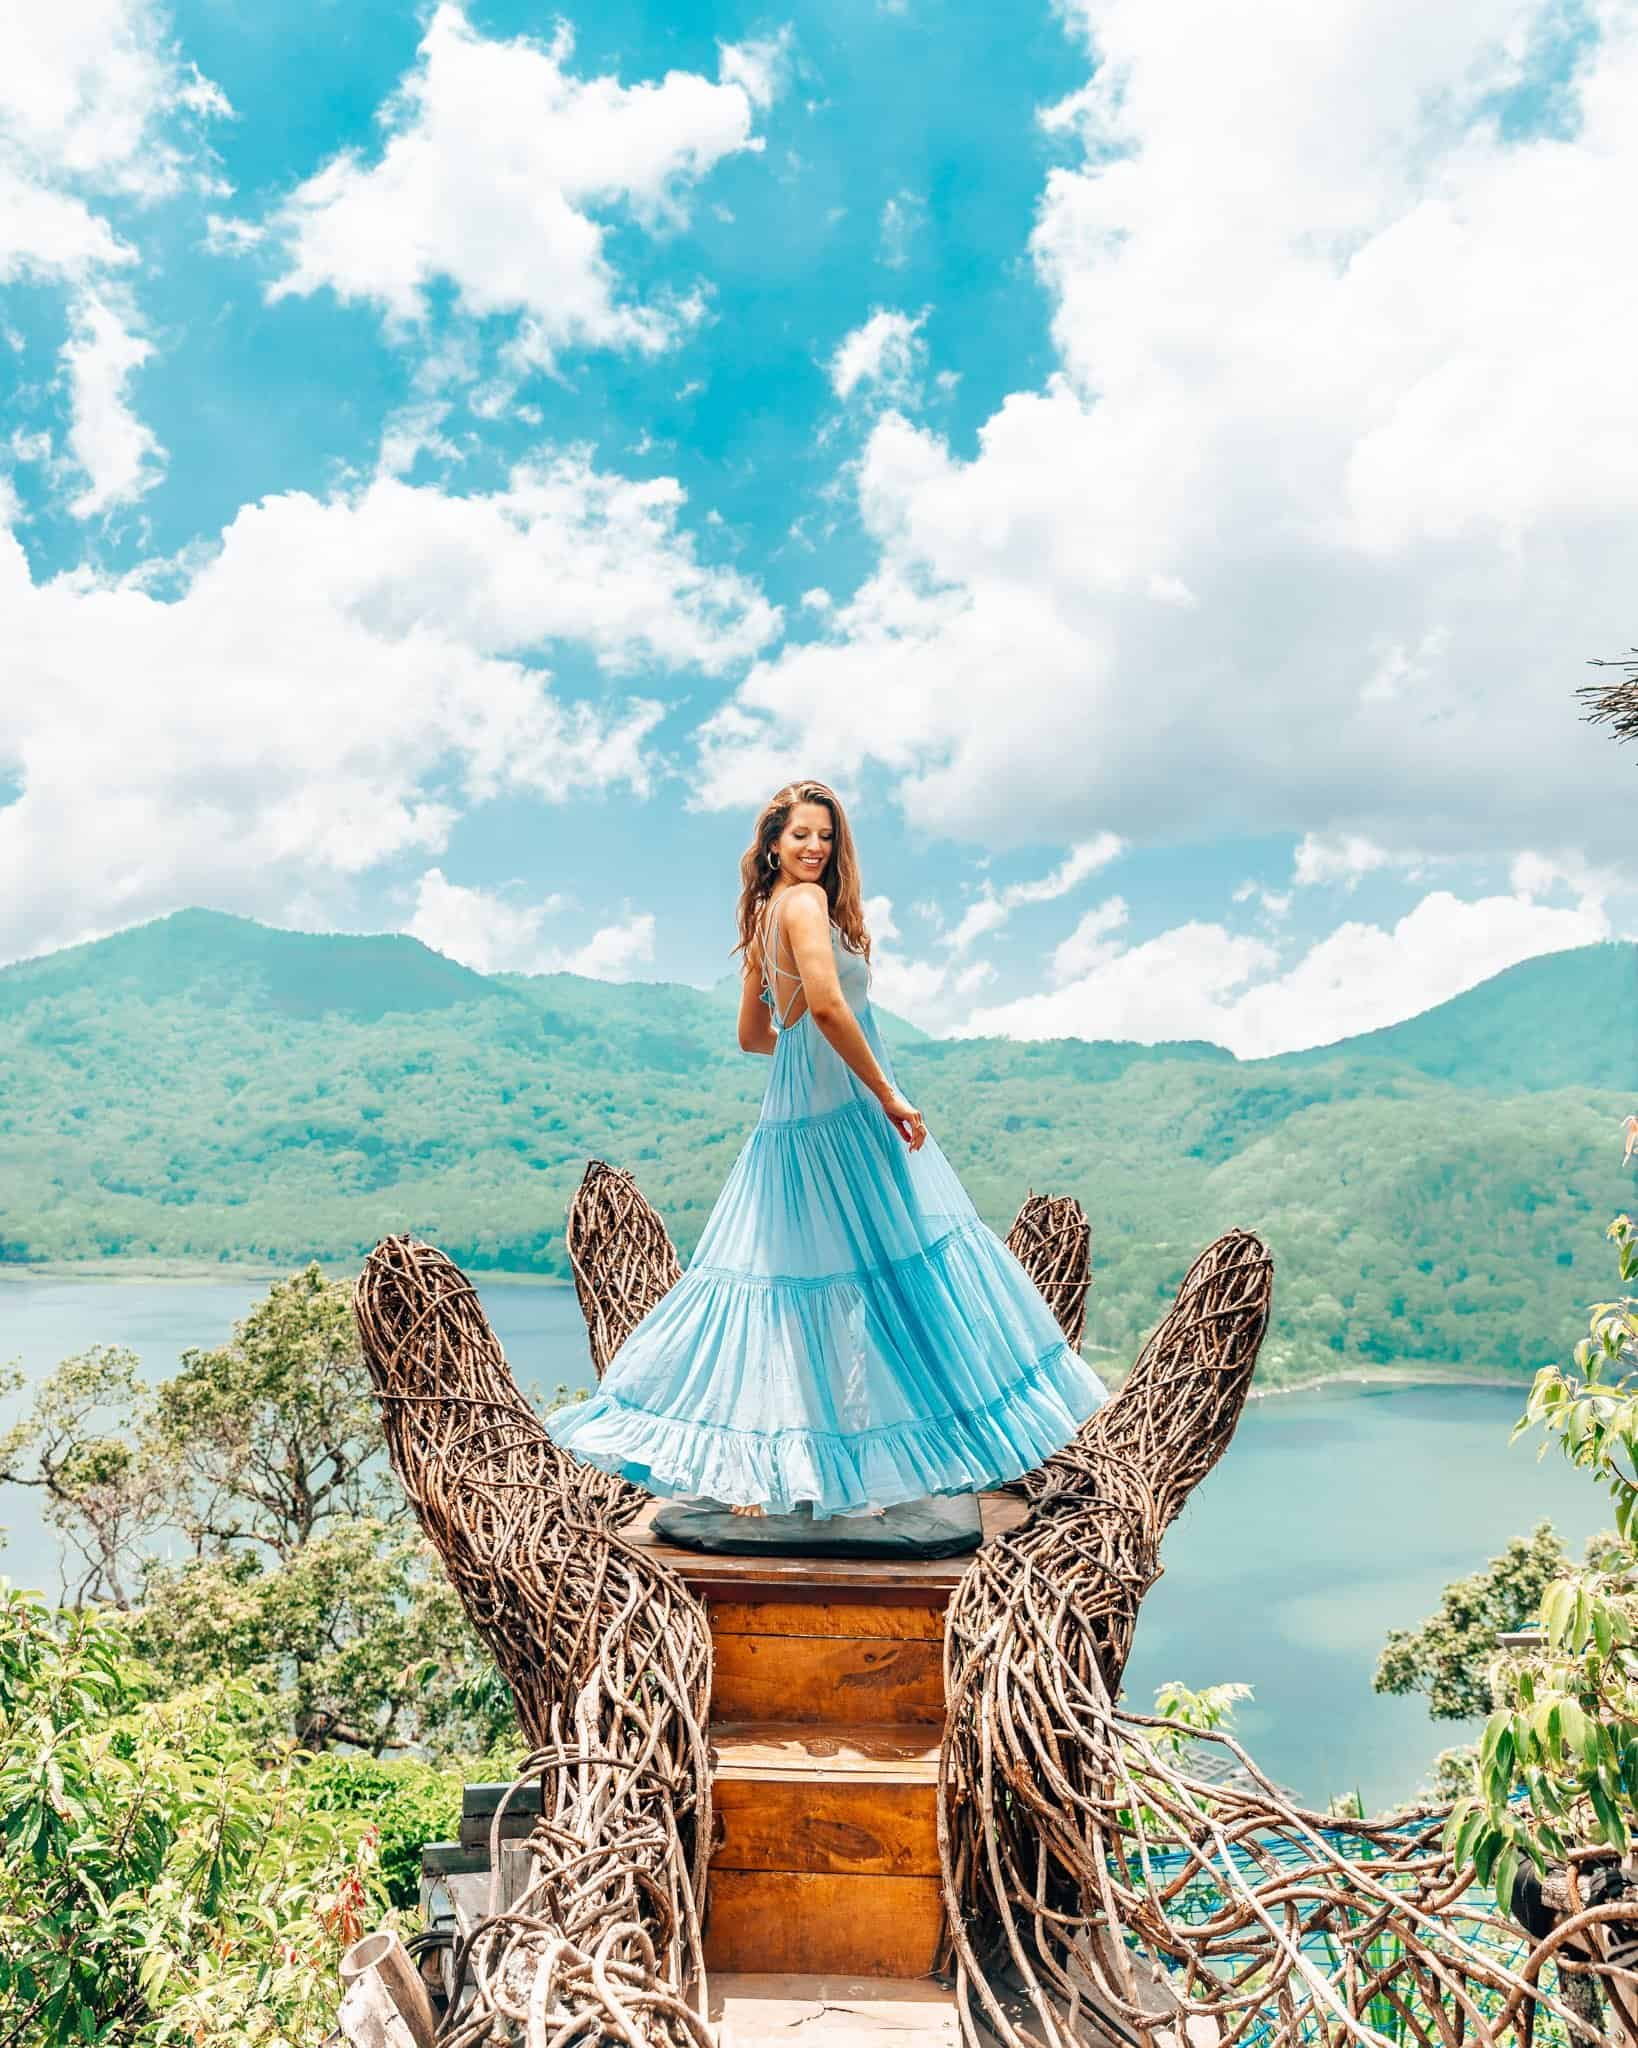 Hidden Hills Wanagiri Bali - The Next Trip